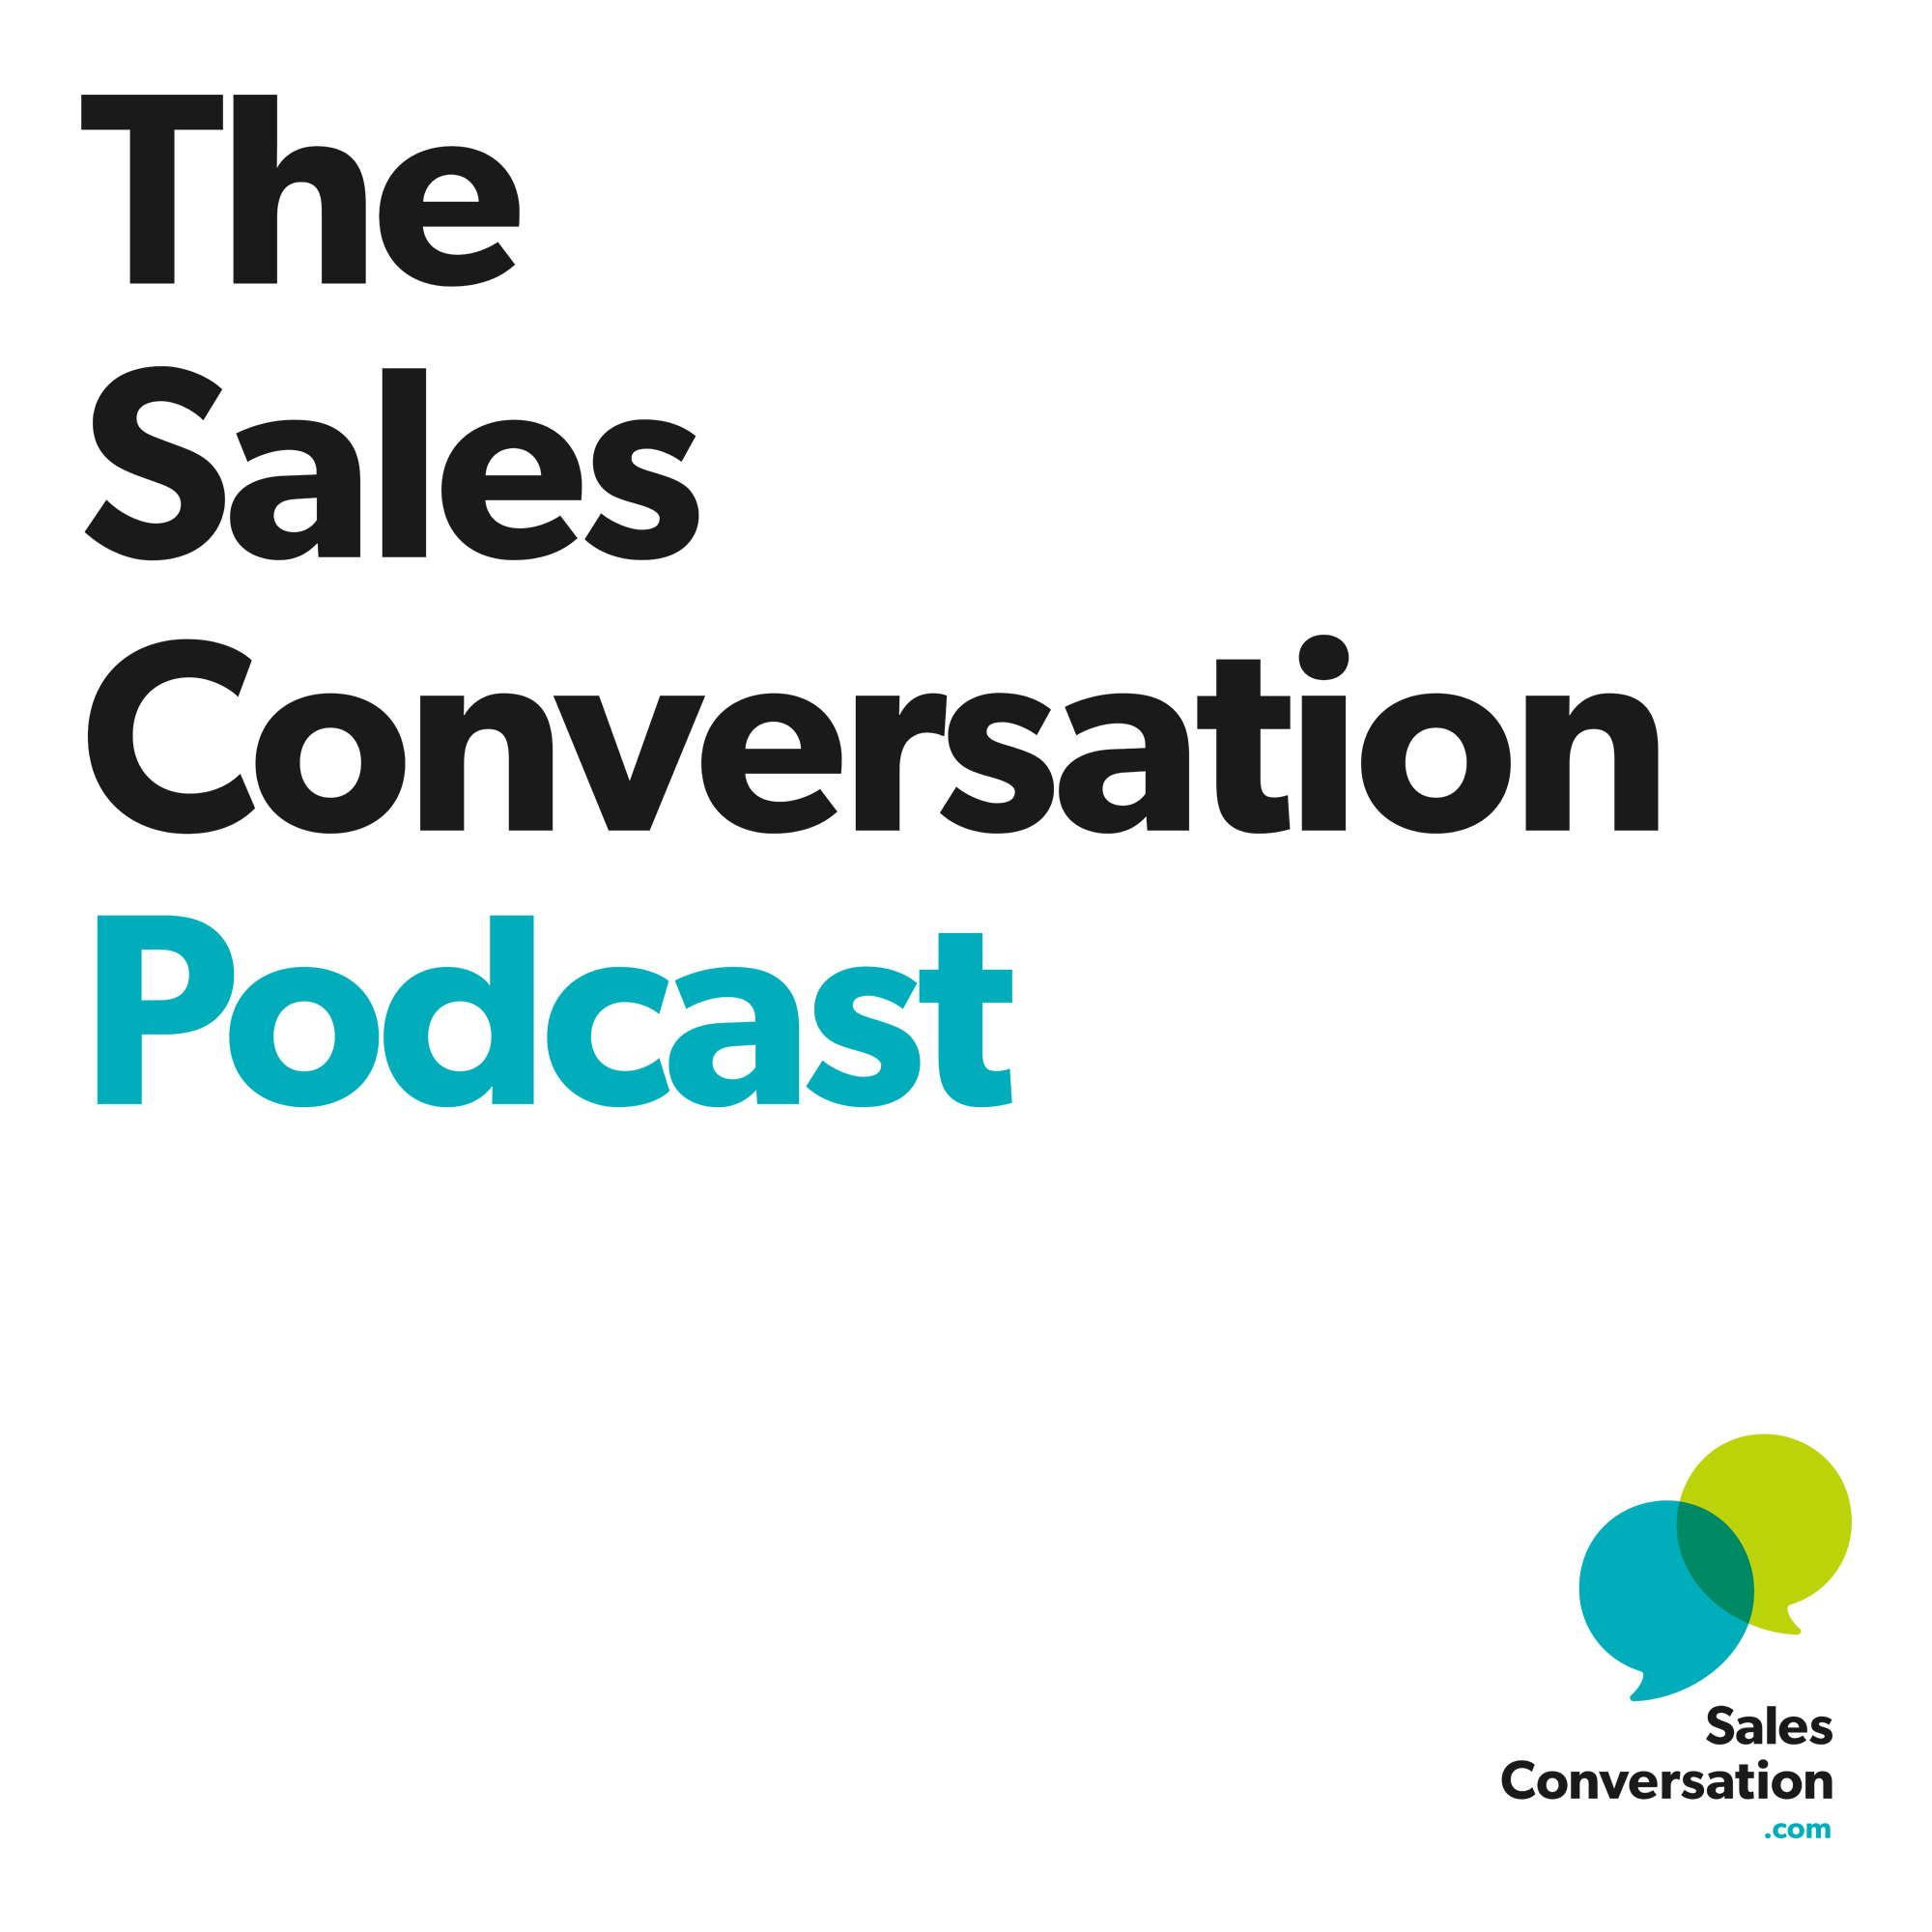 The Sales Conversation Podcast show art